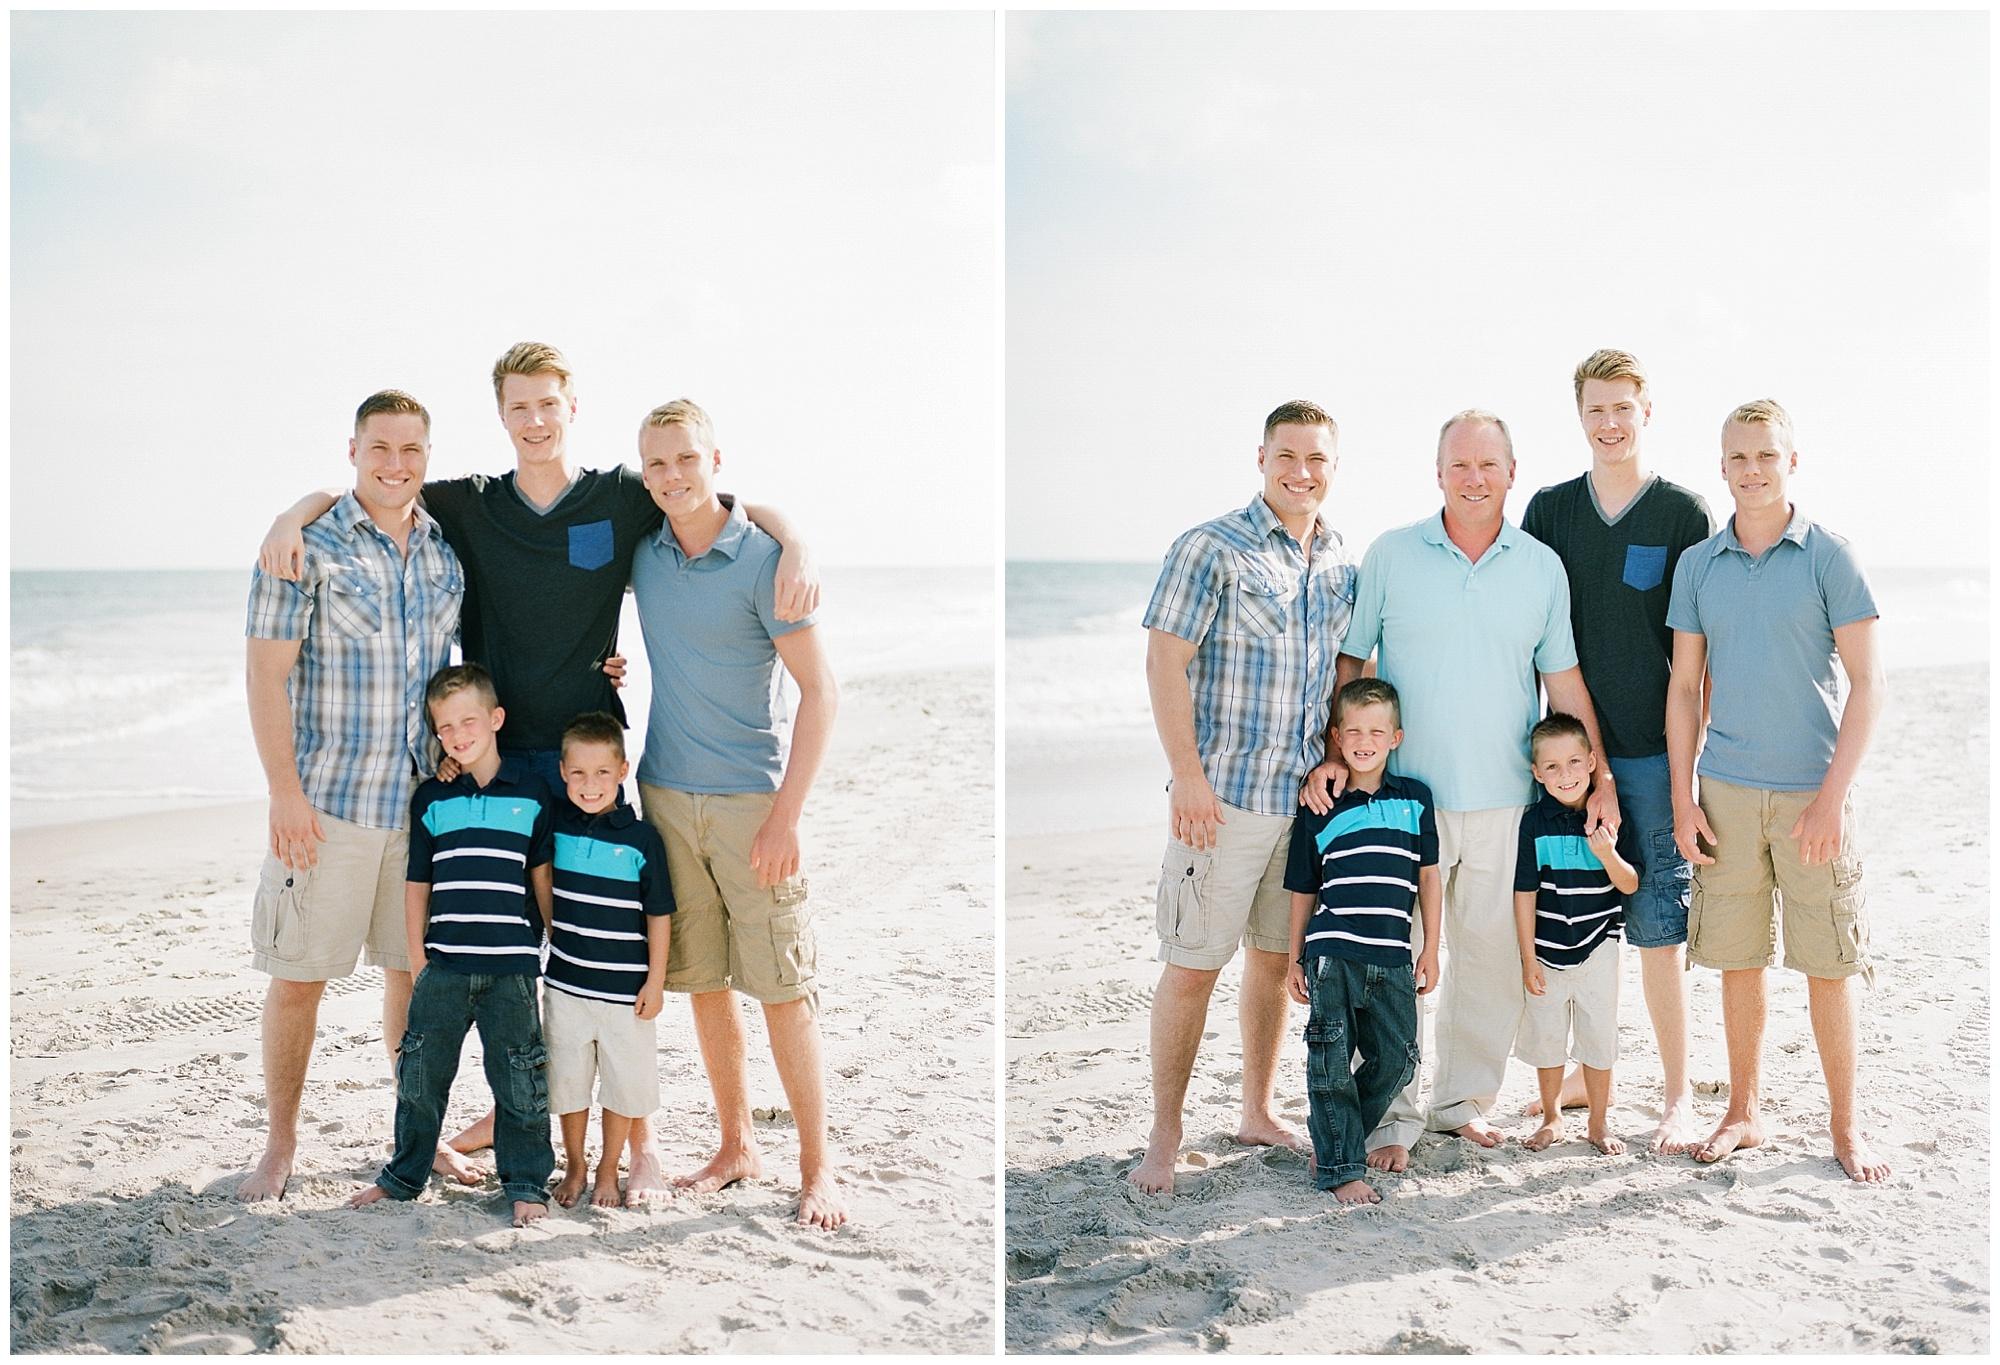 Beach Family Portraits | Wynona Benson